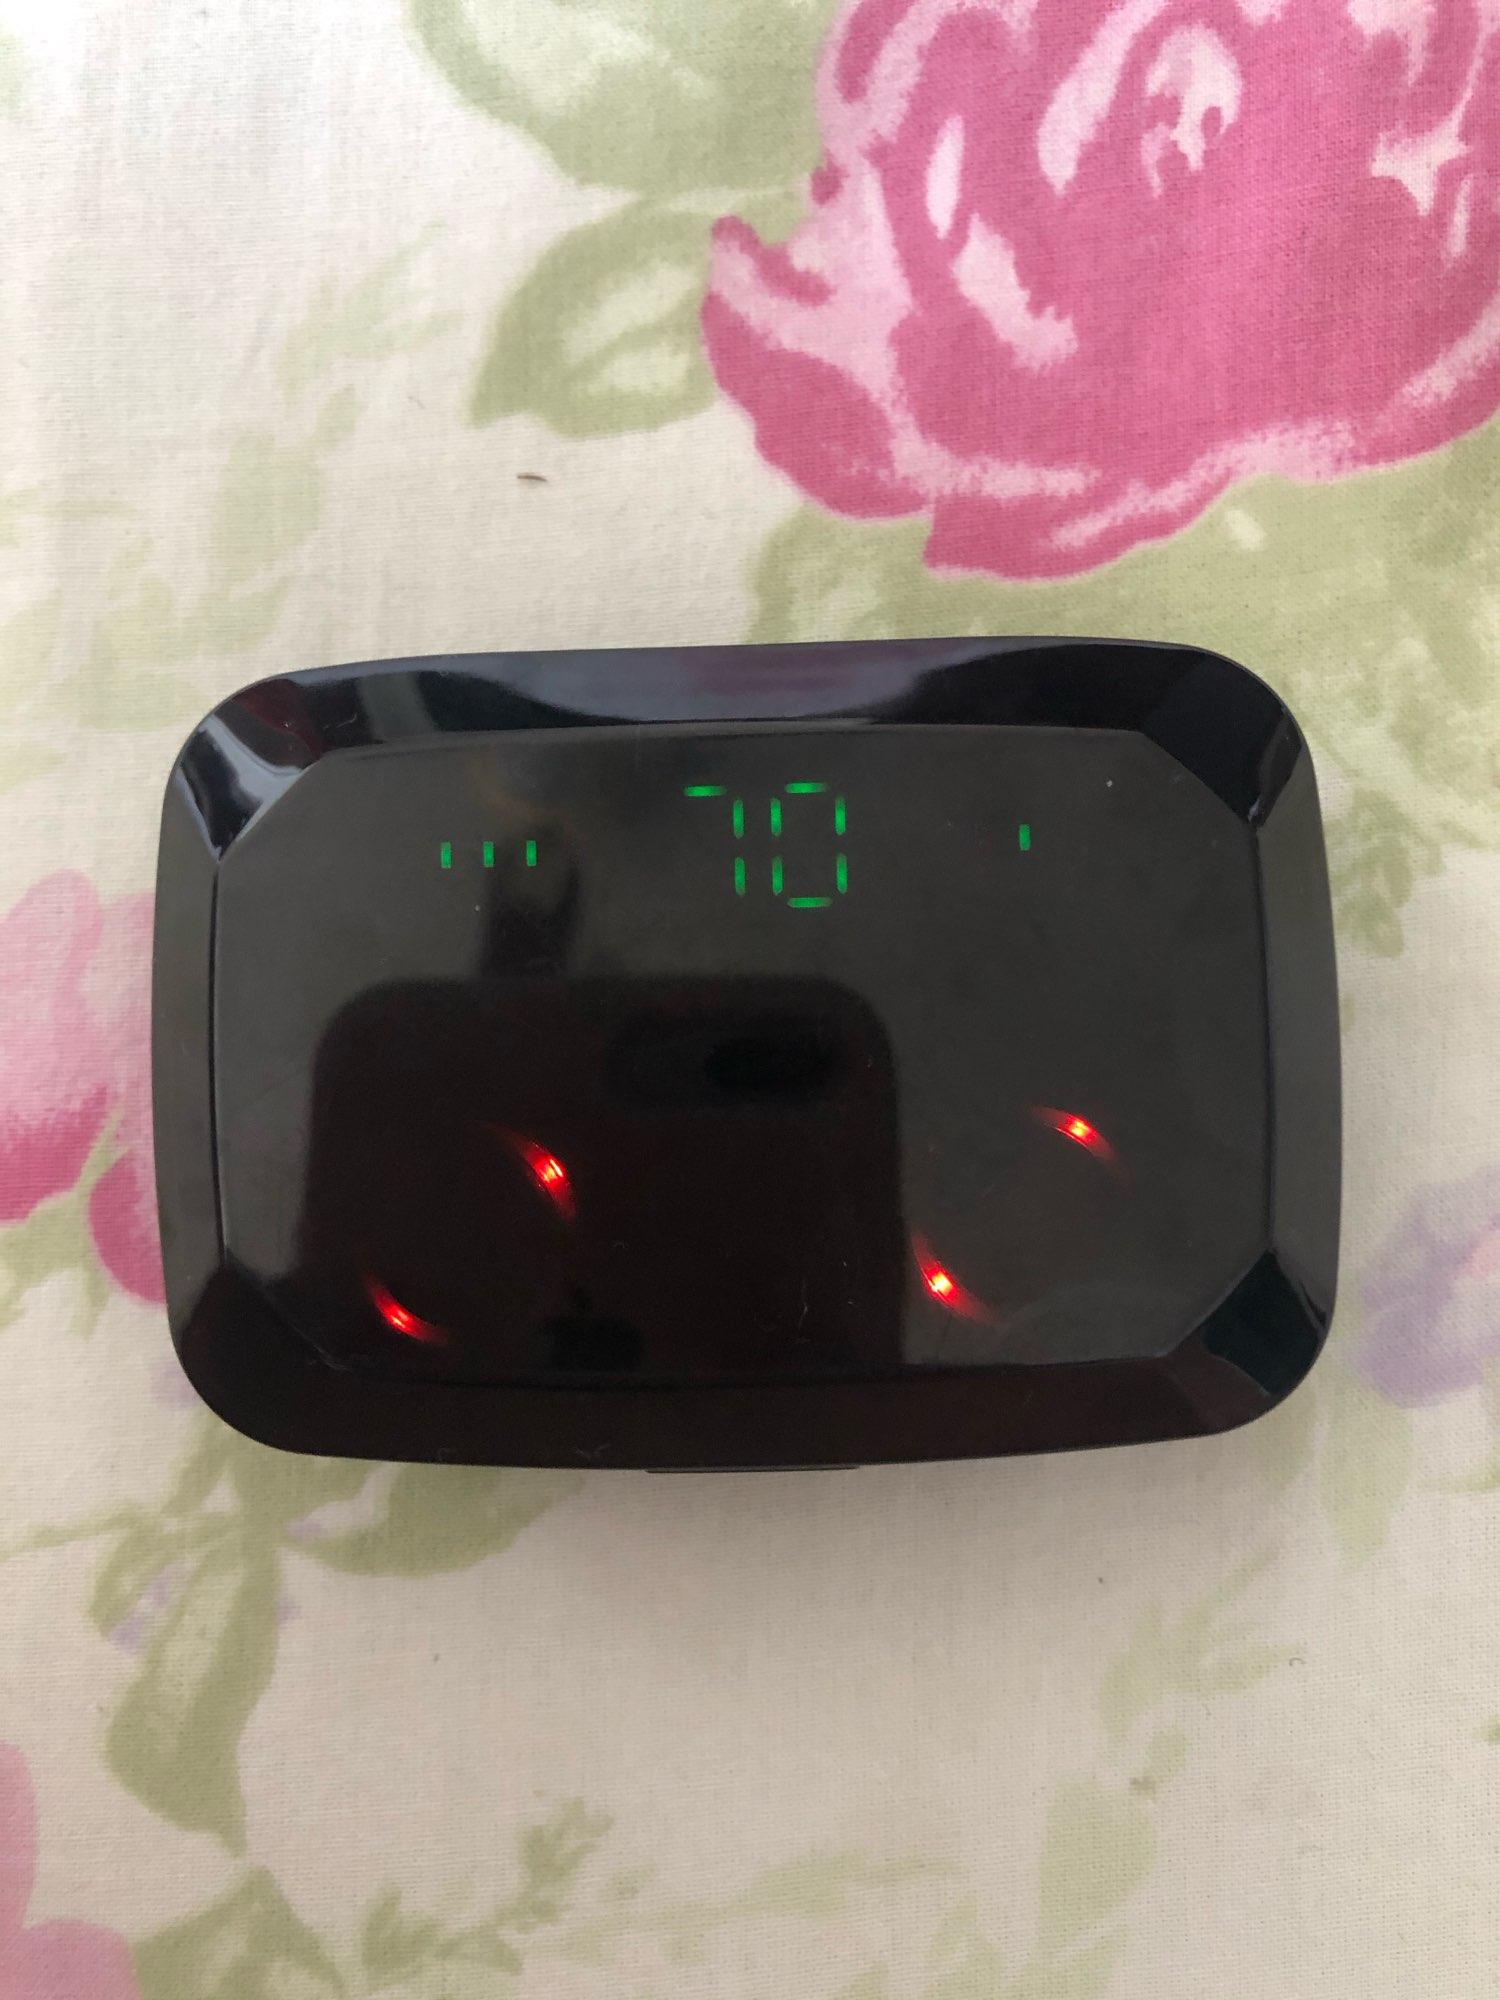 3500mAh Wireless Earphones Bluetooth Compatible V5.0 TWS Wireless Headphones LED Display With Power Bank Headset With Microphone Bluetooth Earphones & Headphones    - AliExpress